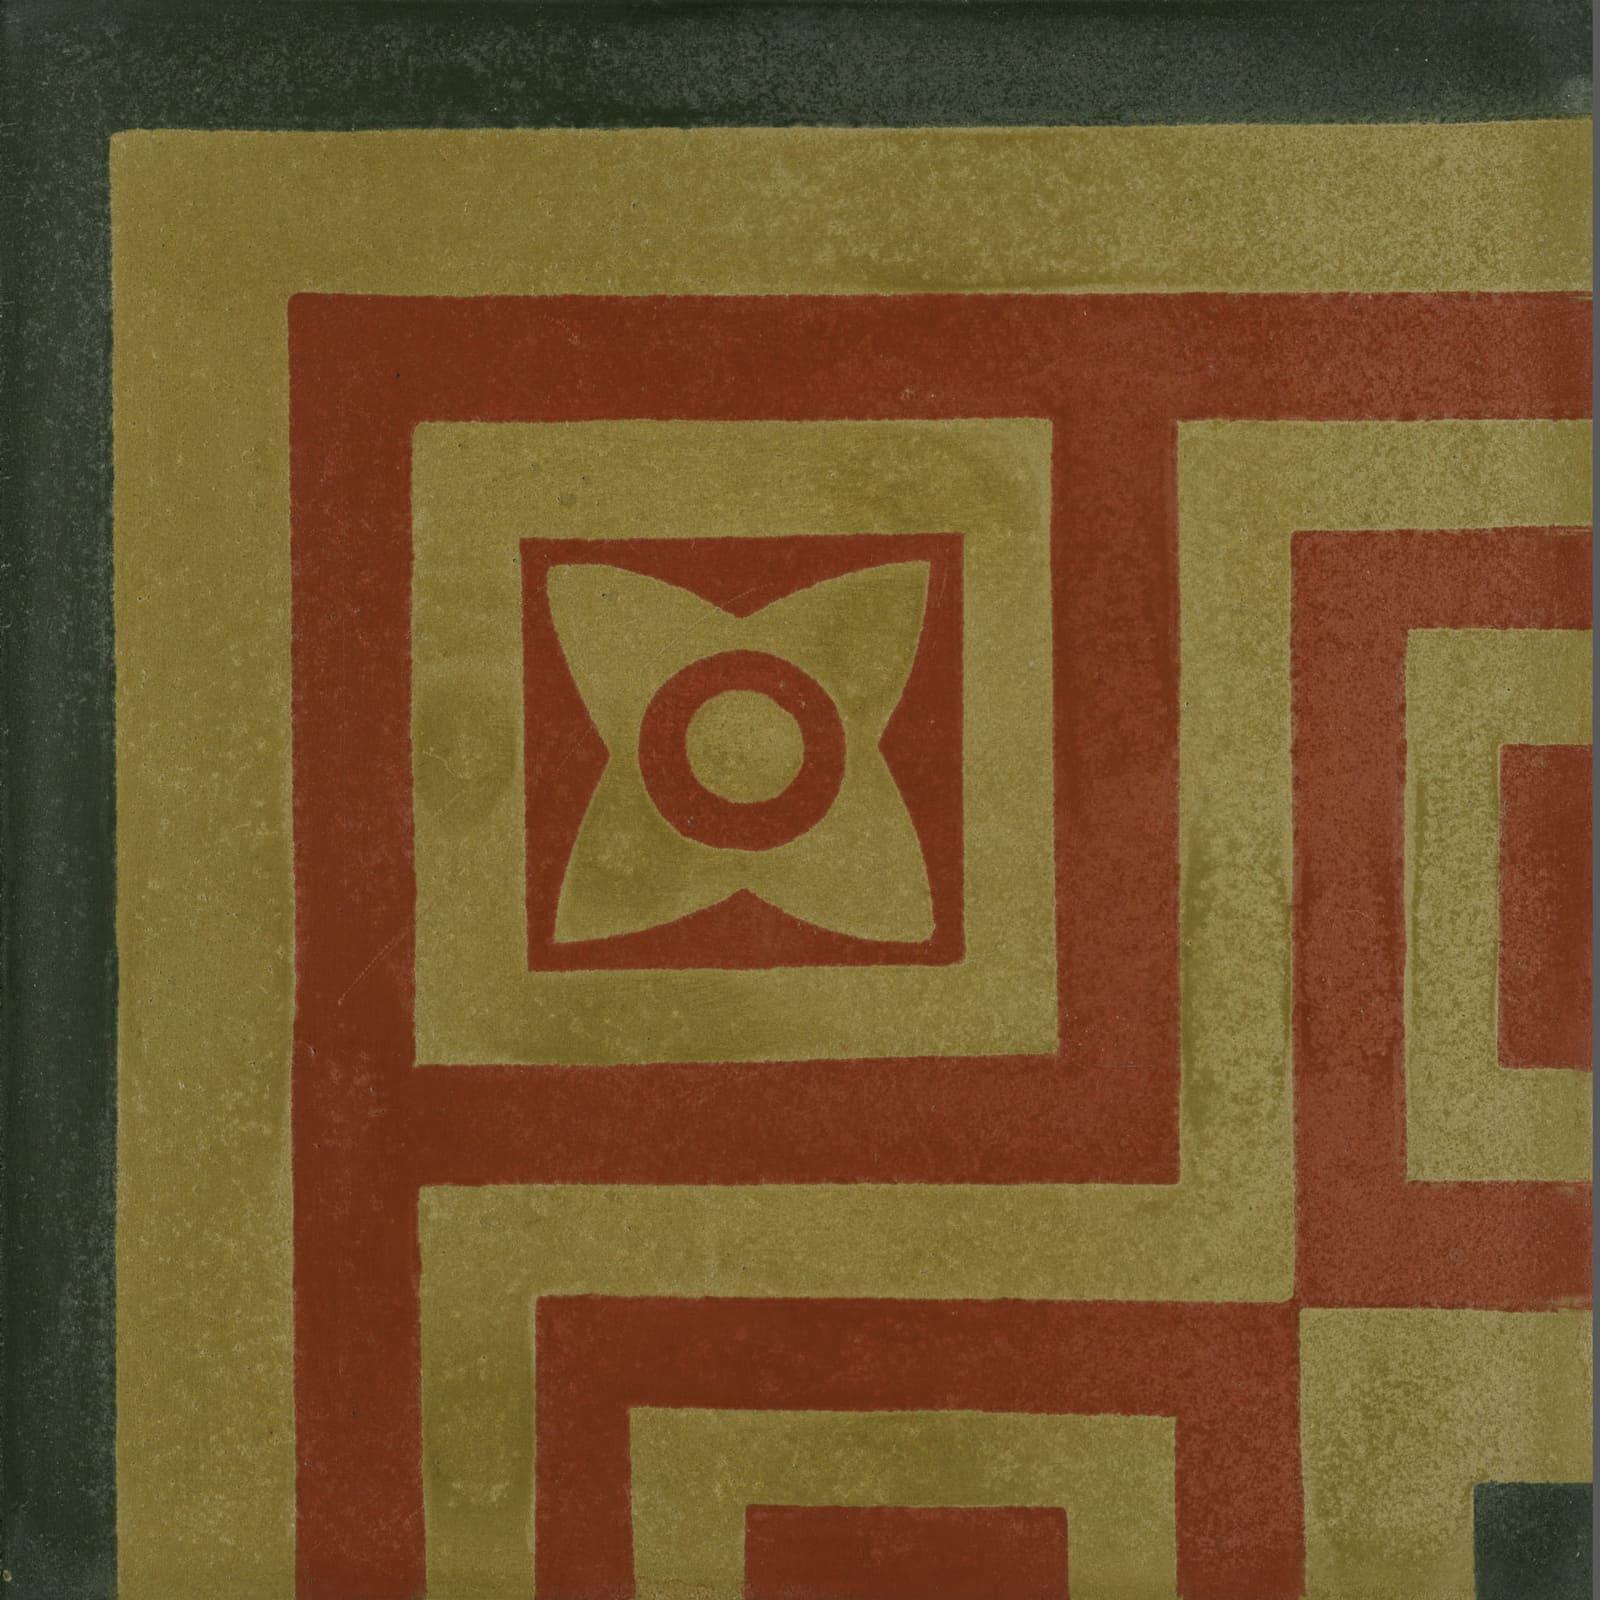 zementfliesen-terrazzofliesen-kreidefarbe-terrazzo-fugenlos-viaplatten-55055 | 55055/168